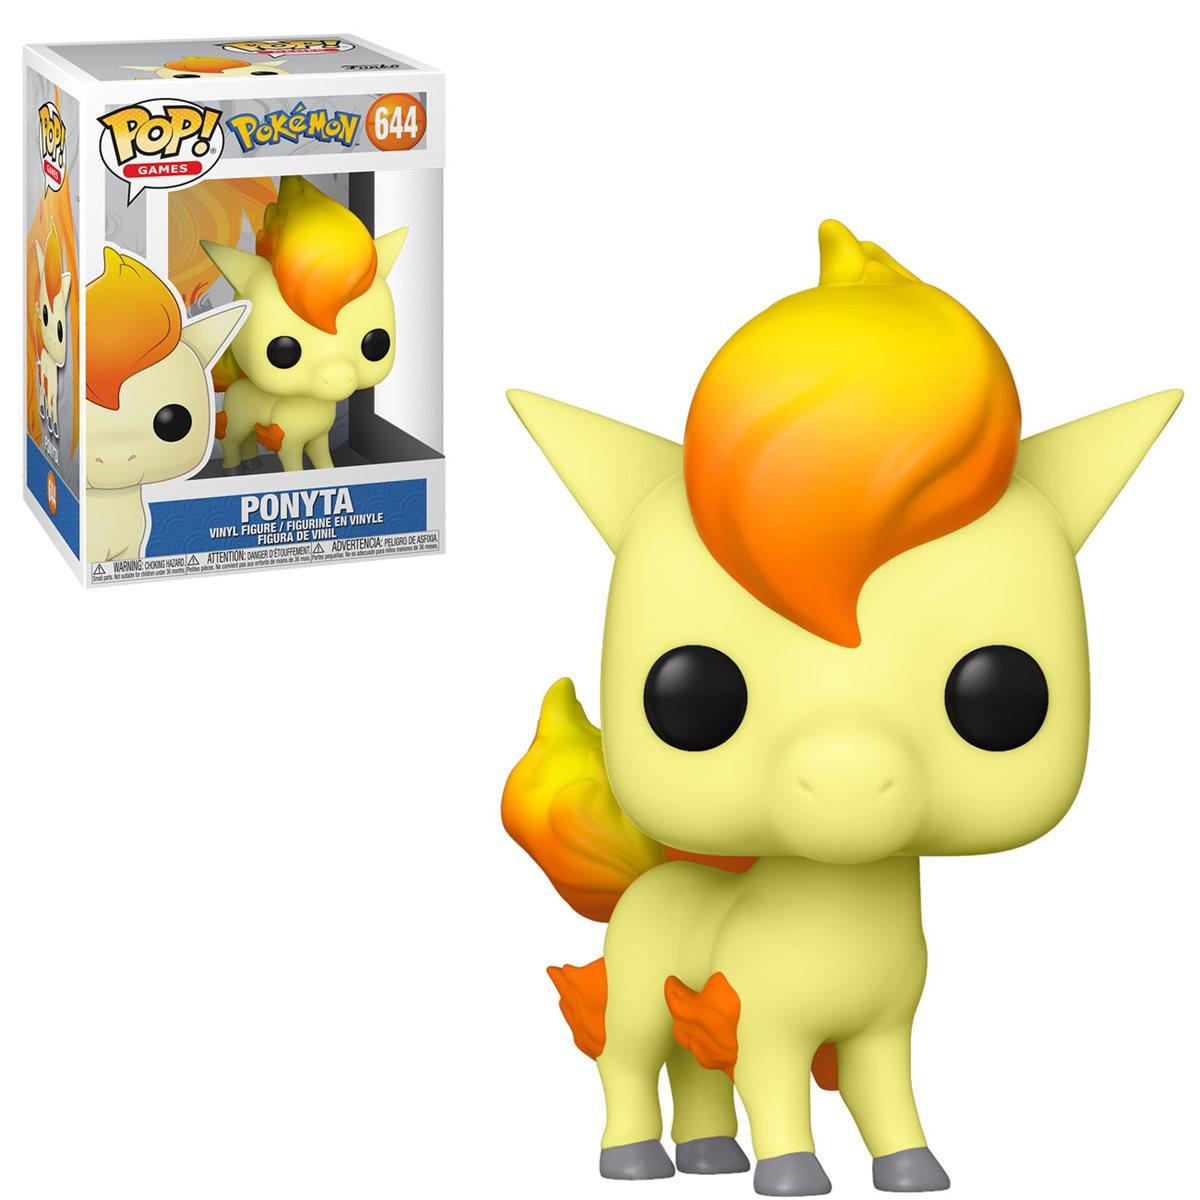 Funko Pop n°644 Pokémon - Ponyta